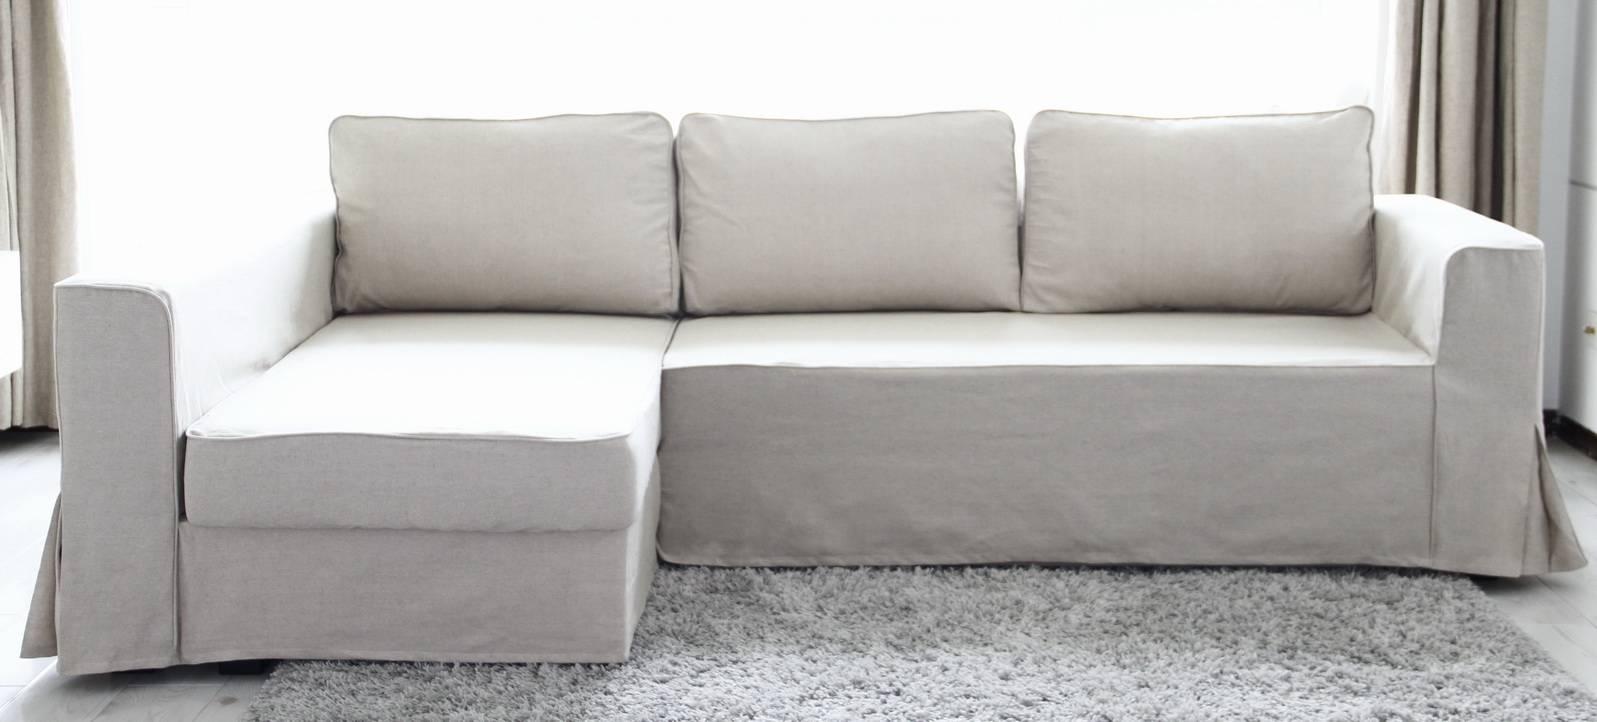 Beautify Your Ikea Sofa With Custom Long Skirt Slipcovers with regard to Sleeper Sofa Slipcovers (Image 1 of 15)